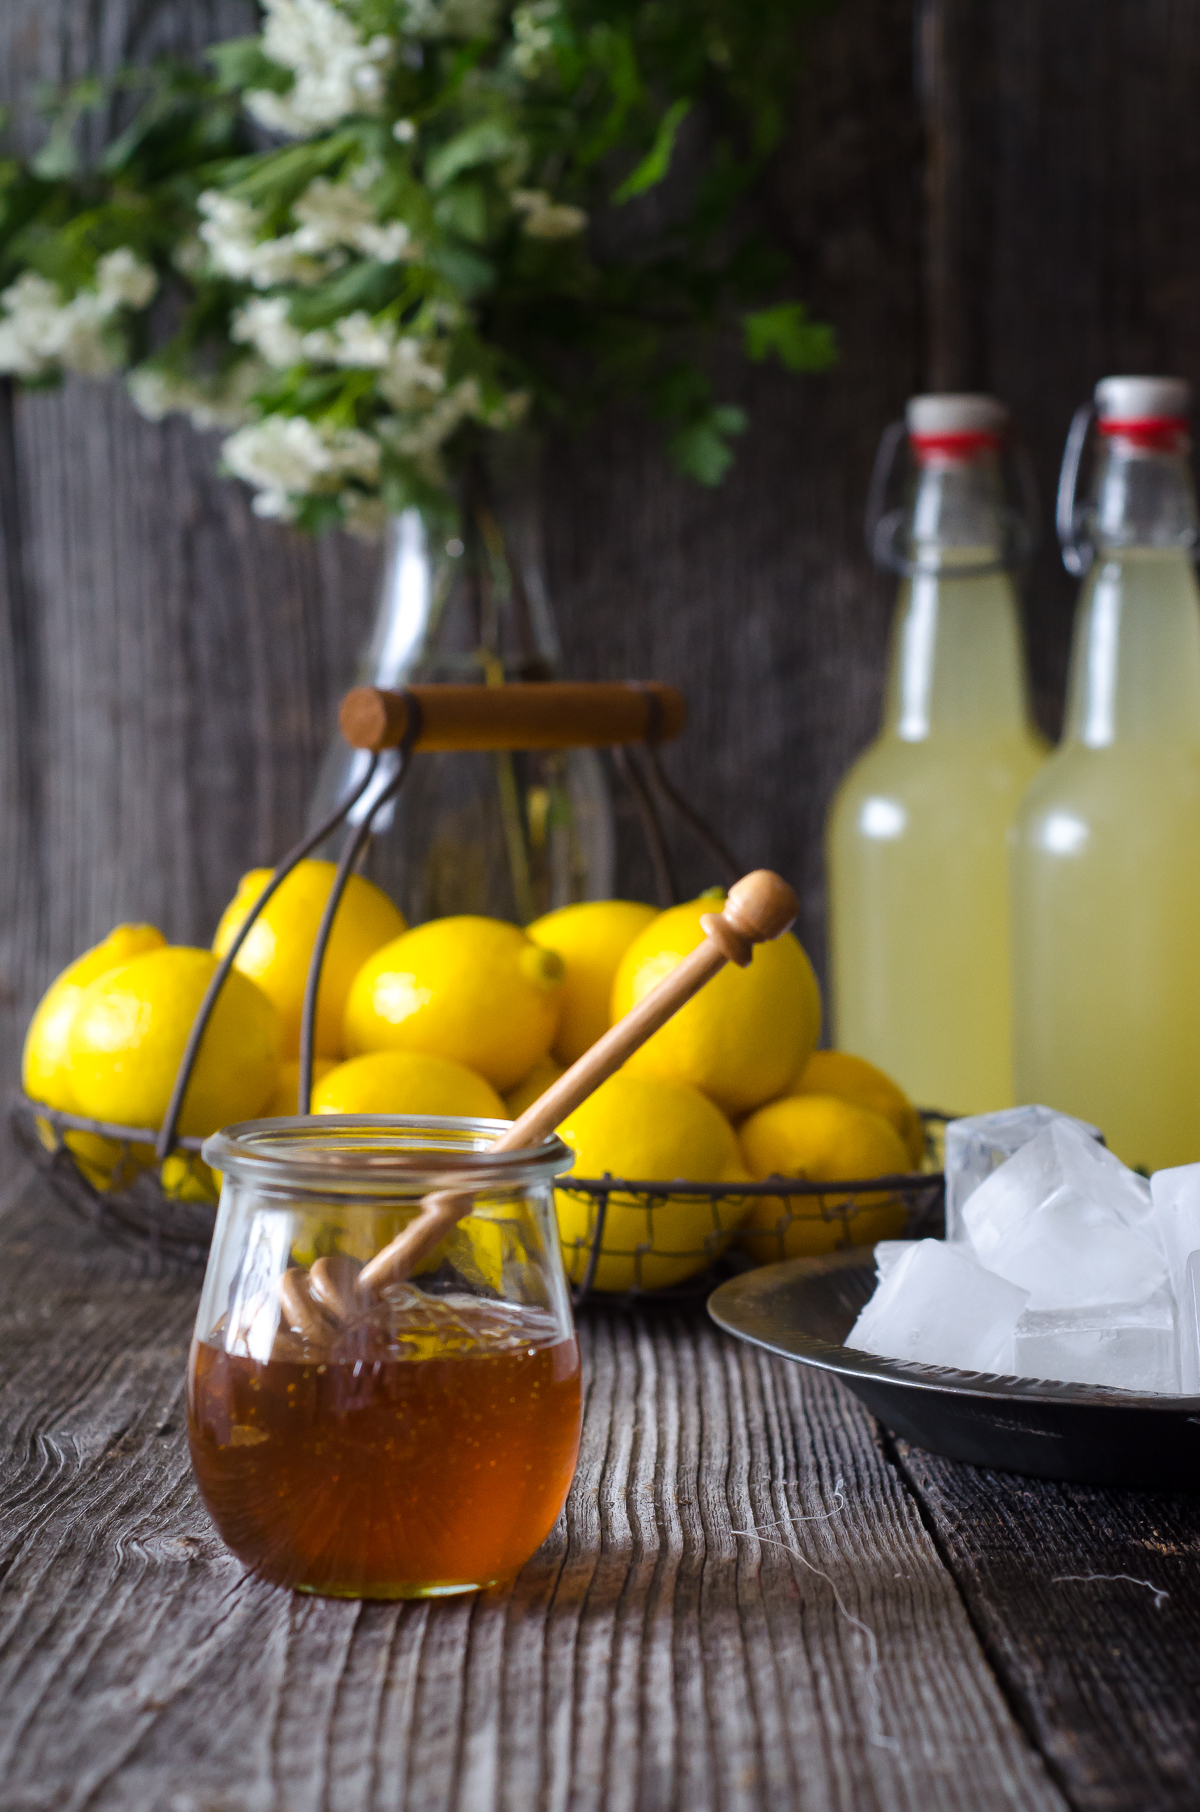 Naturally Fermented, Probiotic Honey Lemonade Soda